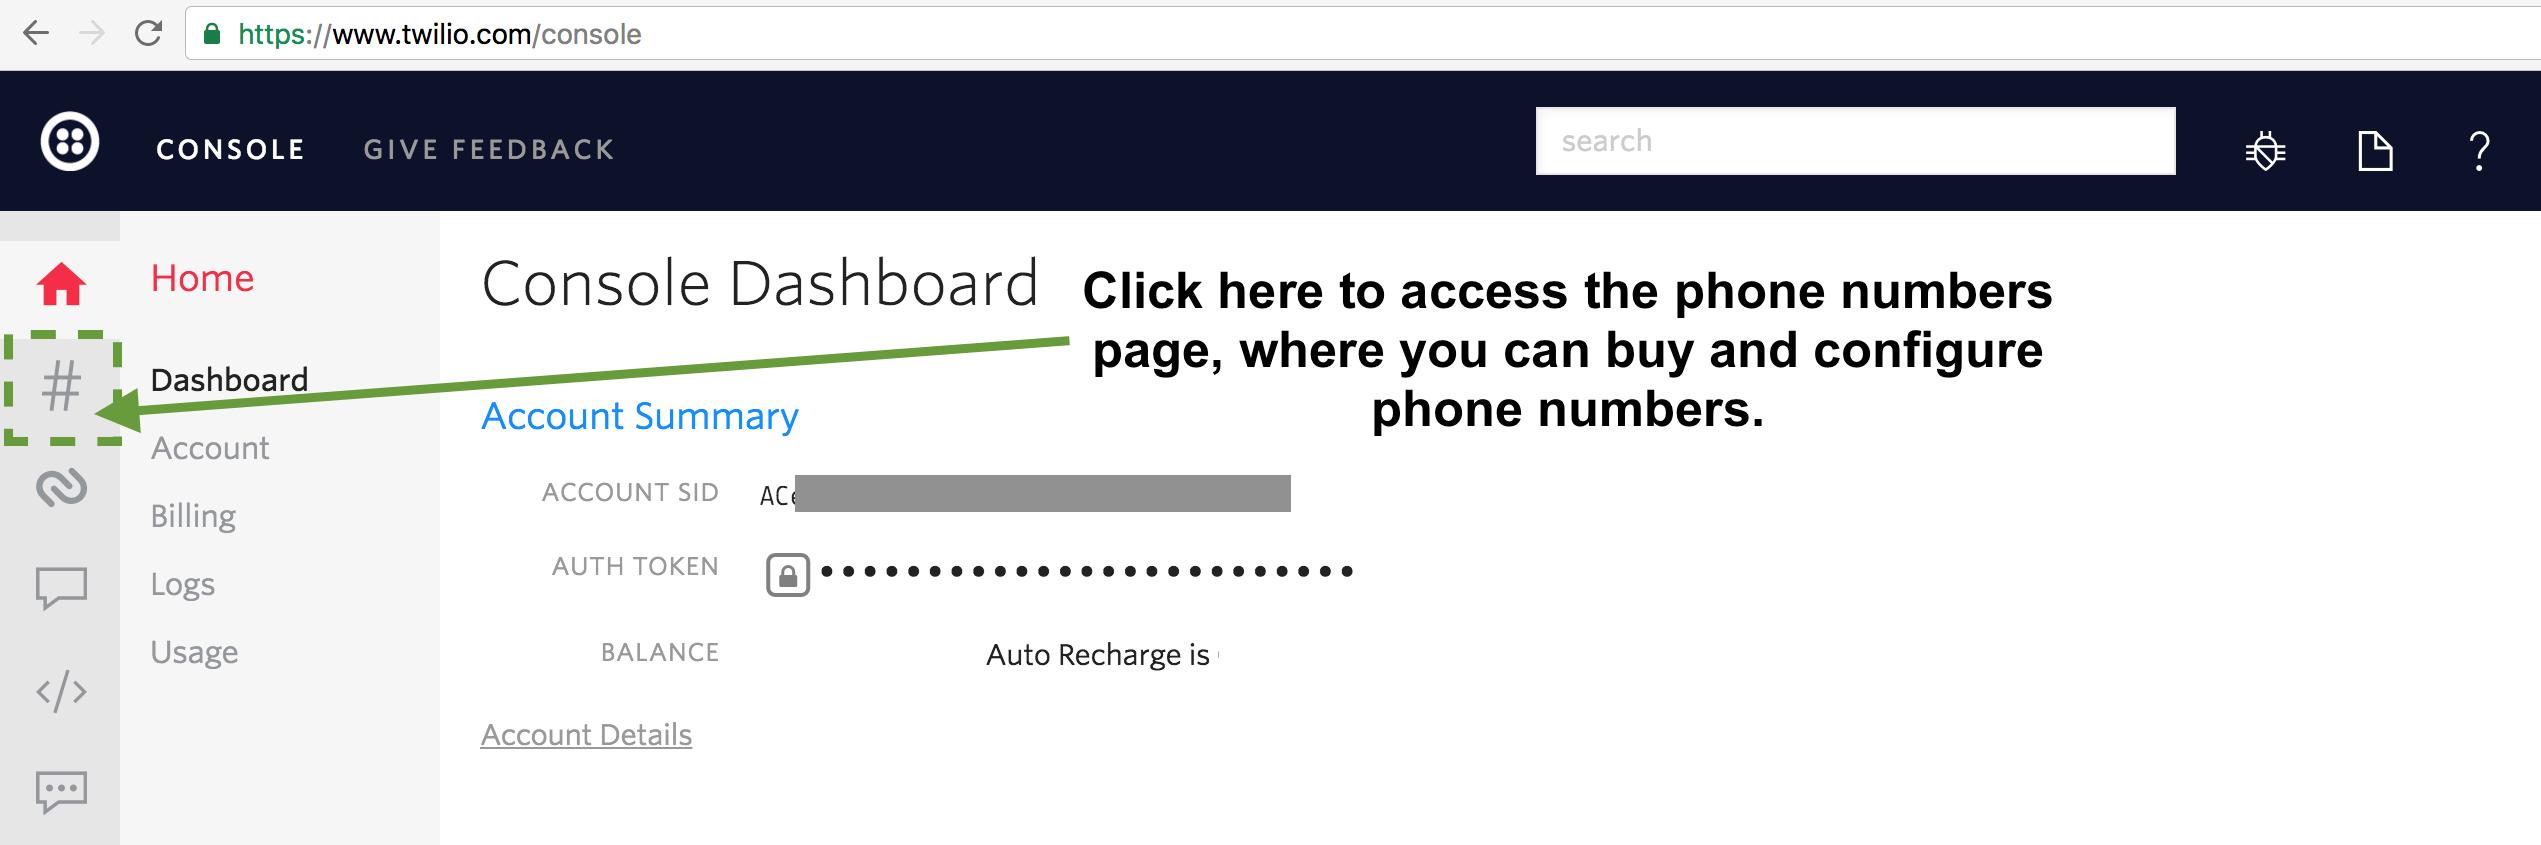 Twilio Console left nav phone numbers screen.